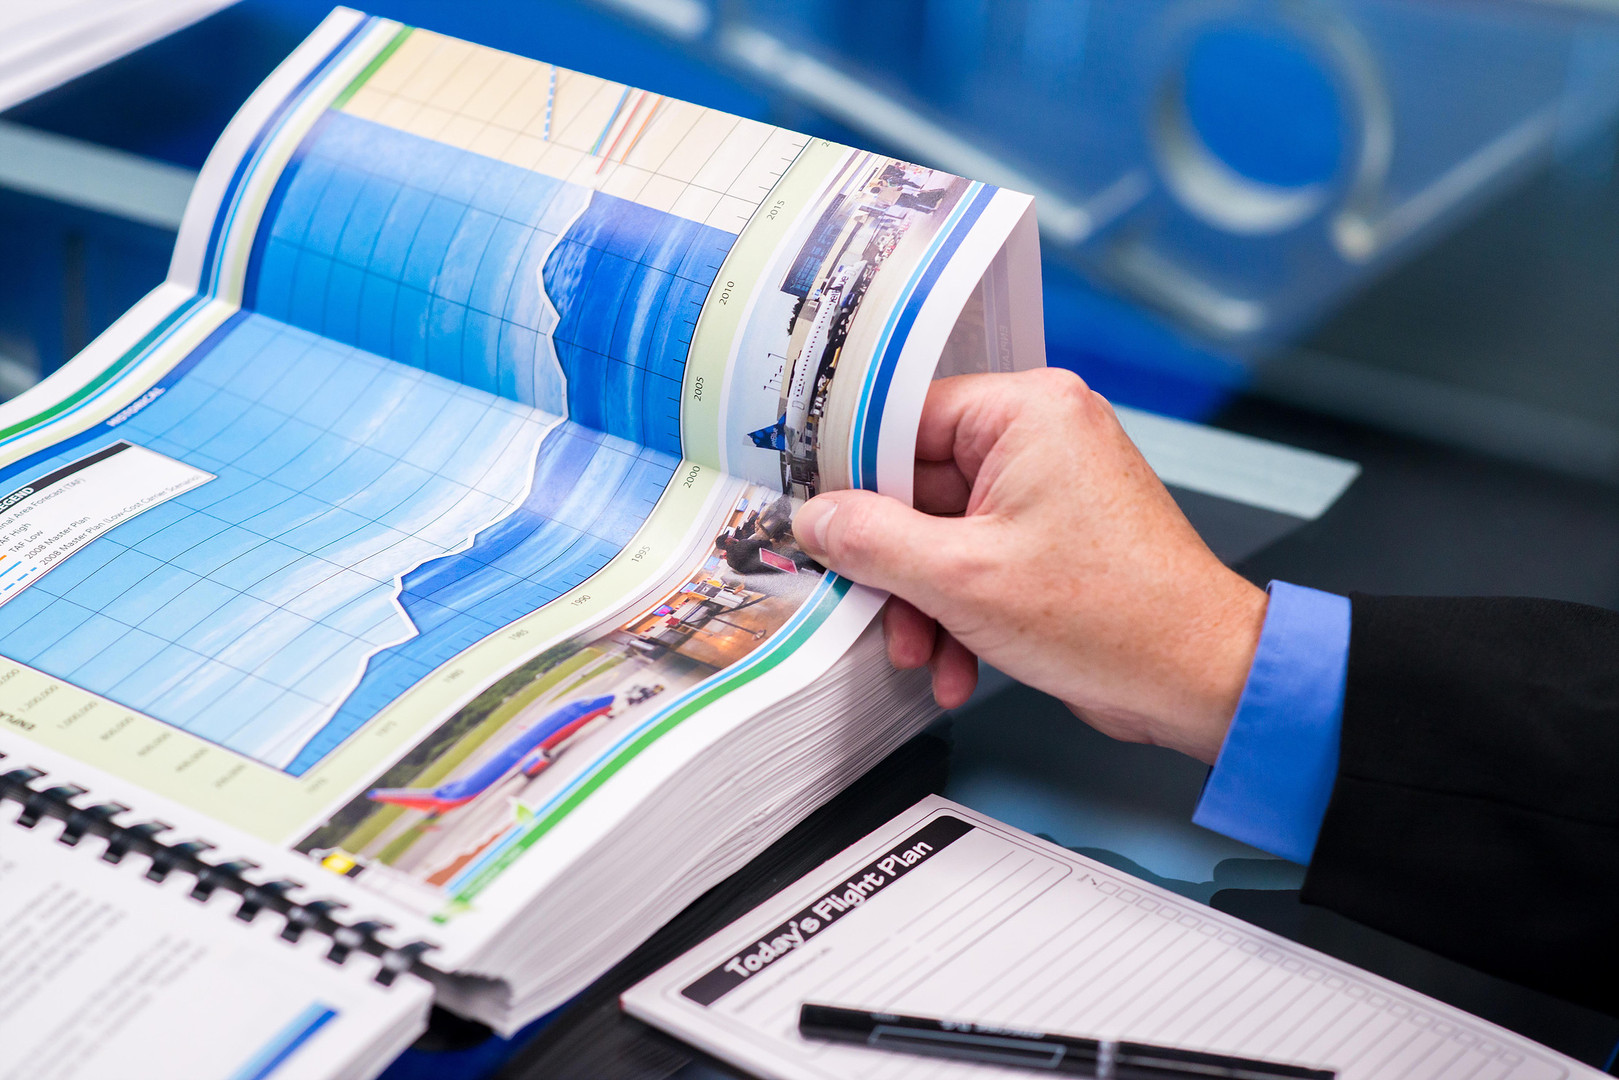 Coffman Associates airport planning